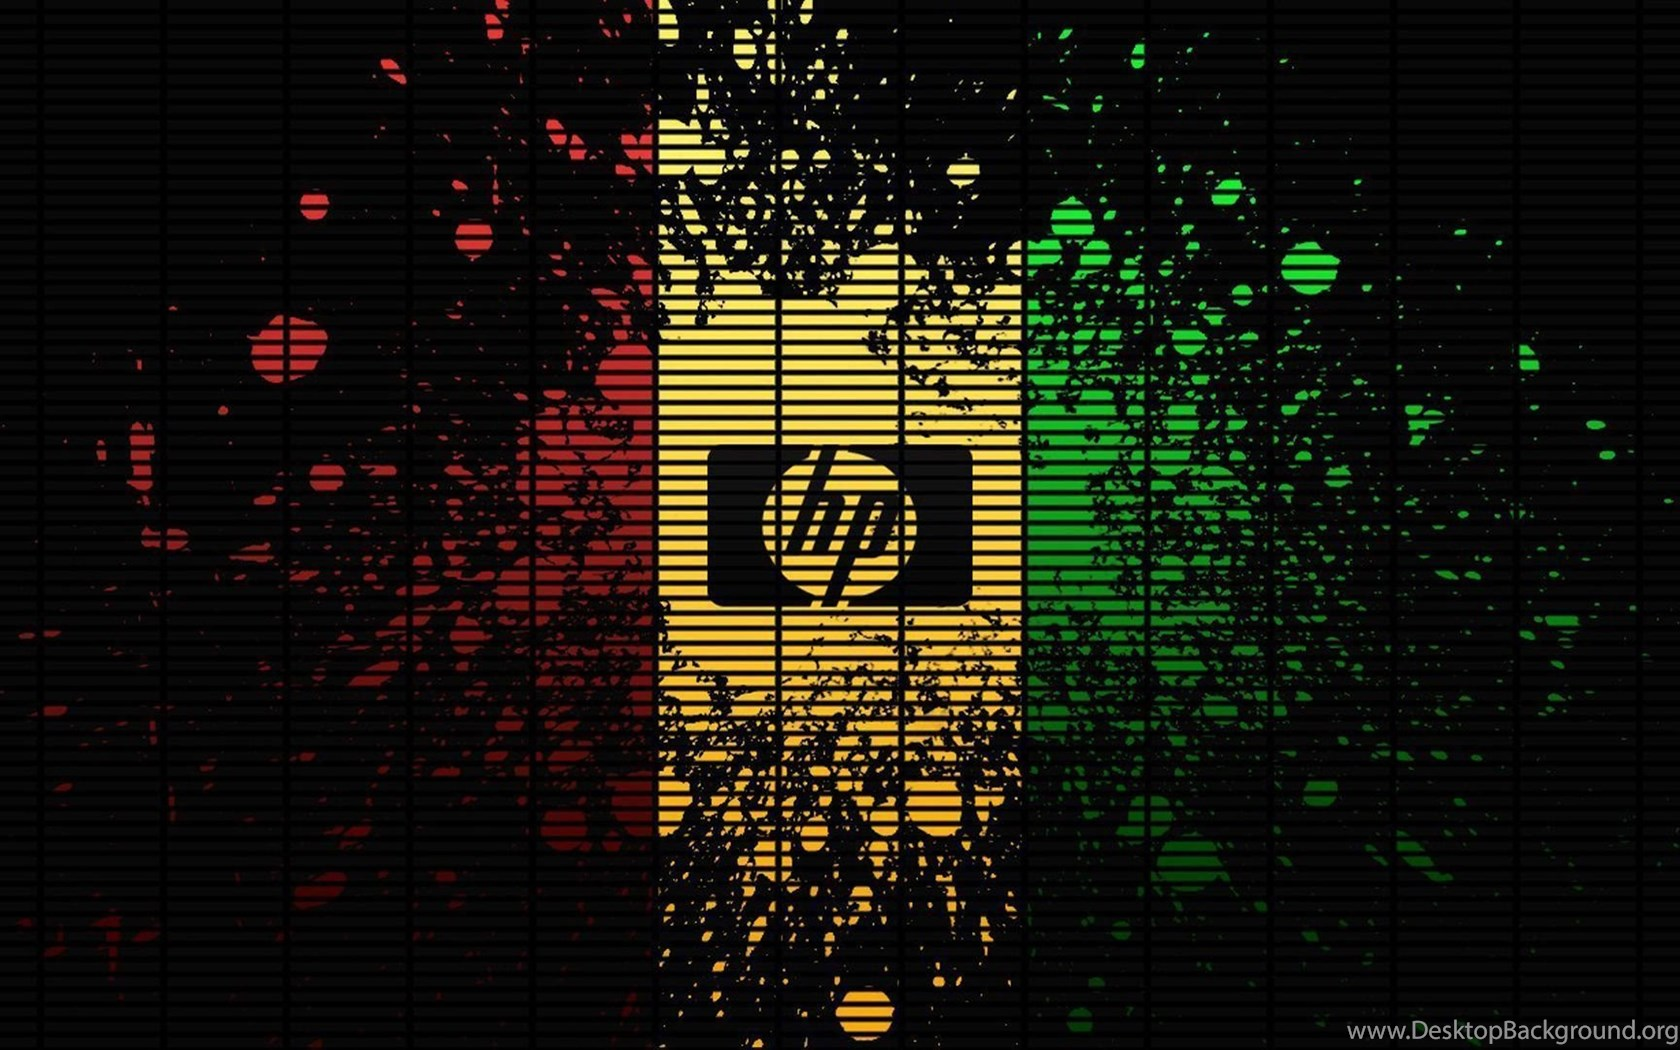 Rasta Top Reggae Laptop 1920x1080 Hd Wallpapers And Free Stock Desktop Background